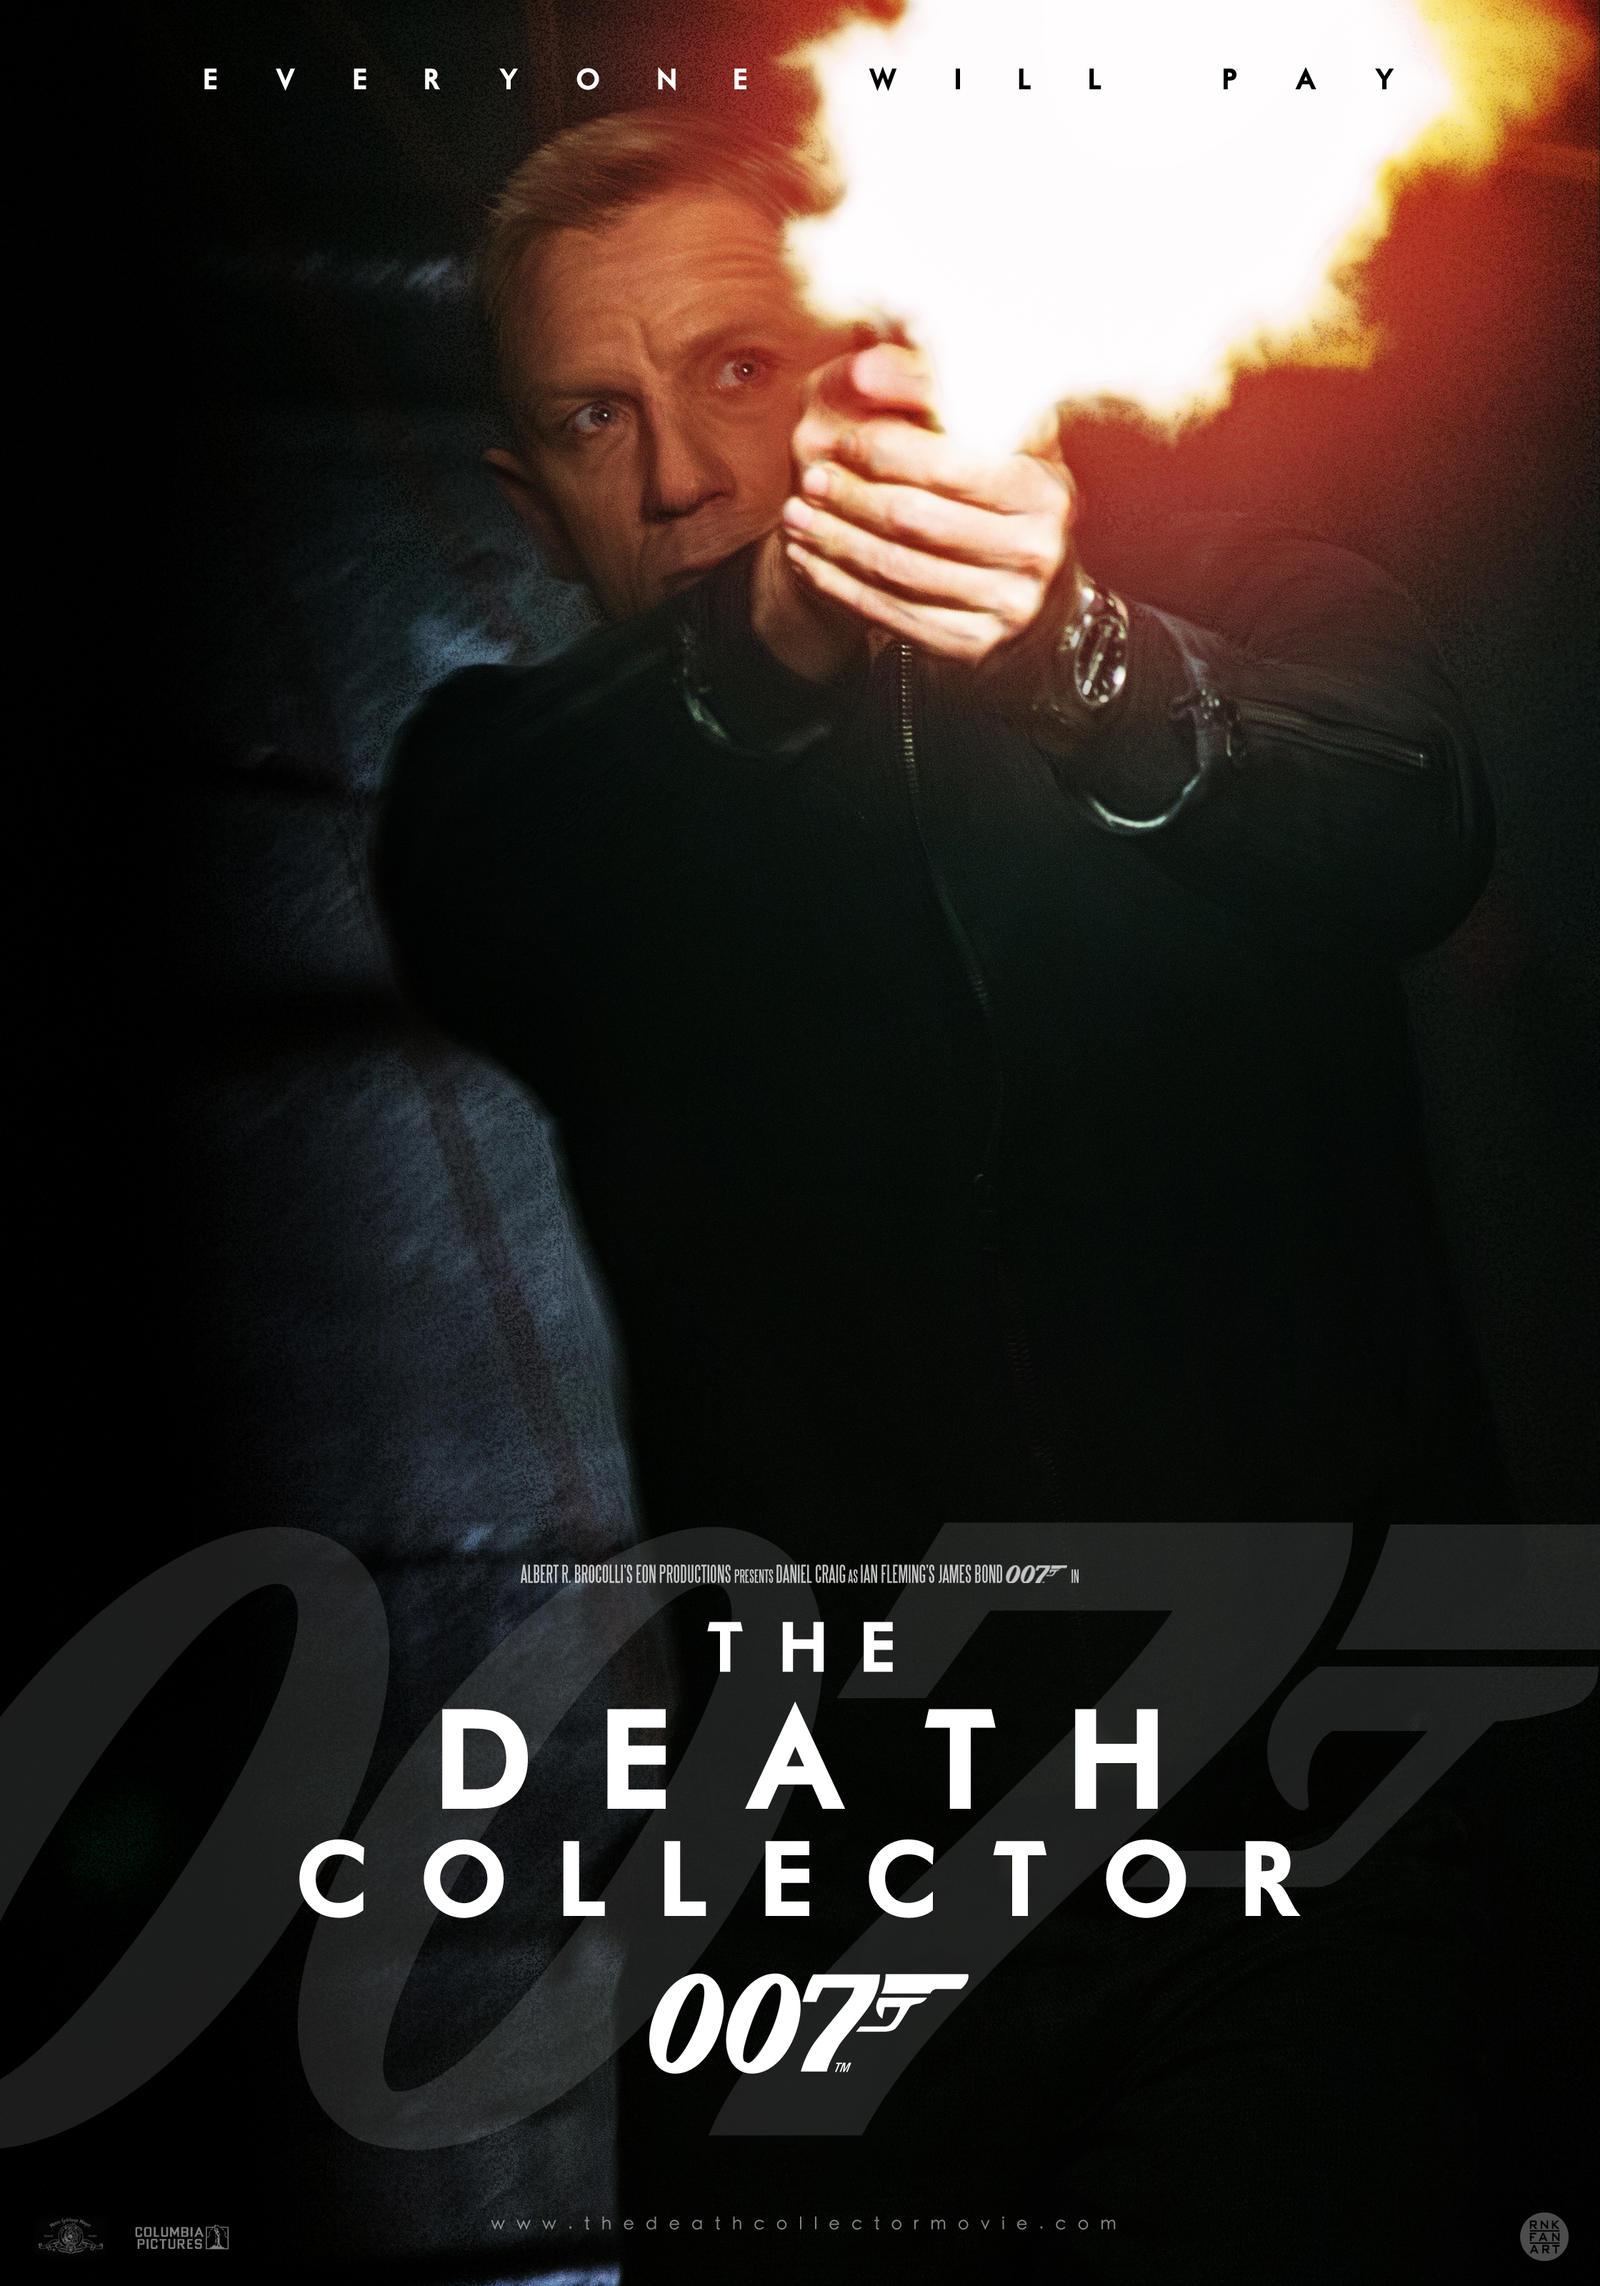 james_bond_25__the_death_collector_tease